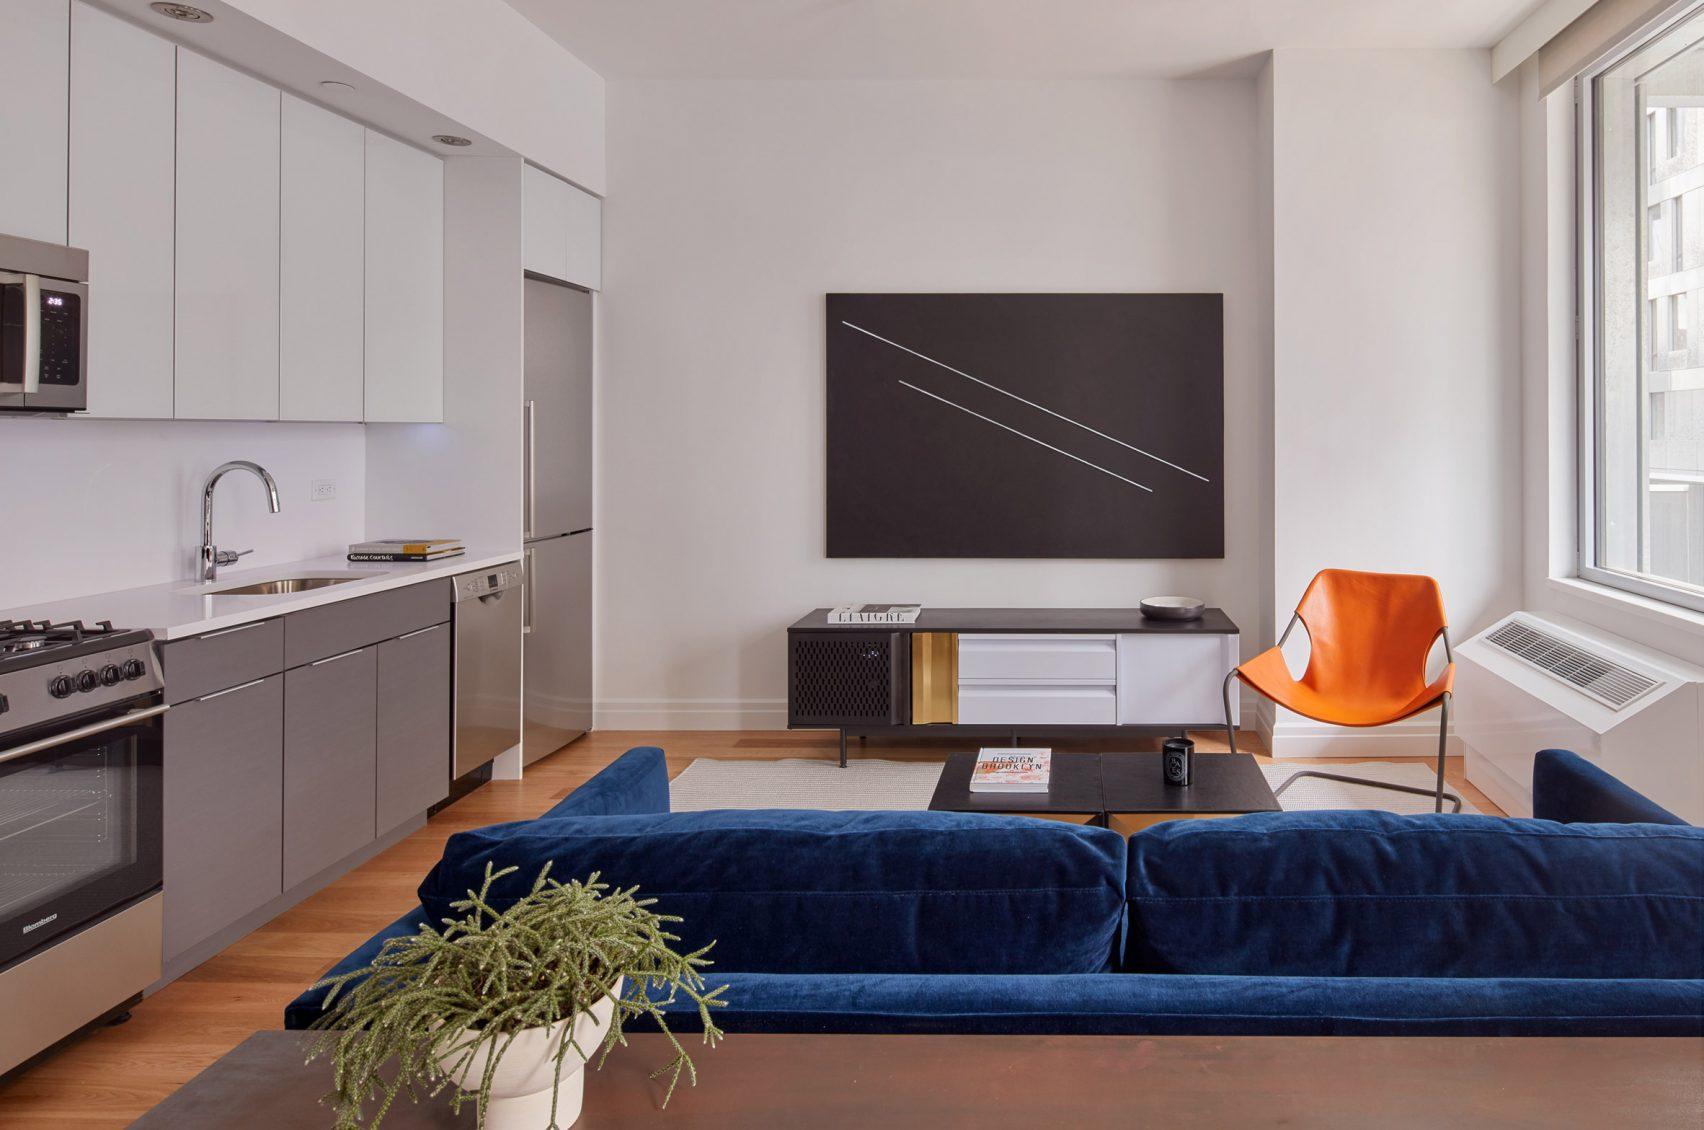 325-kent-shop-architects-brooklyn-noko-09.jpg